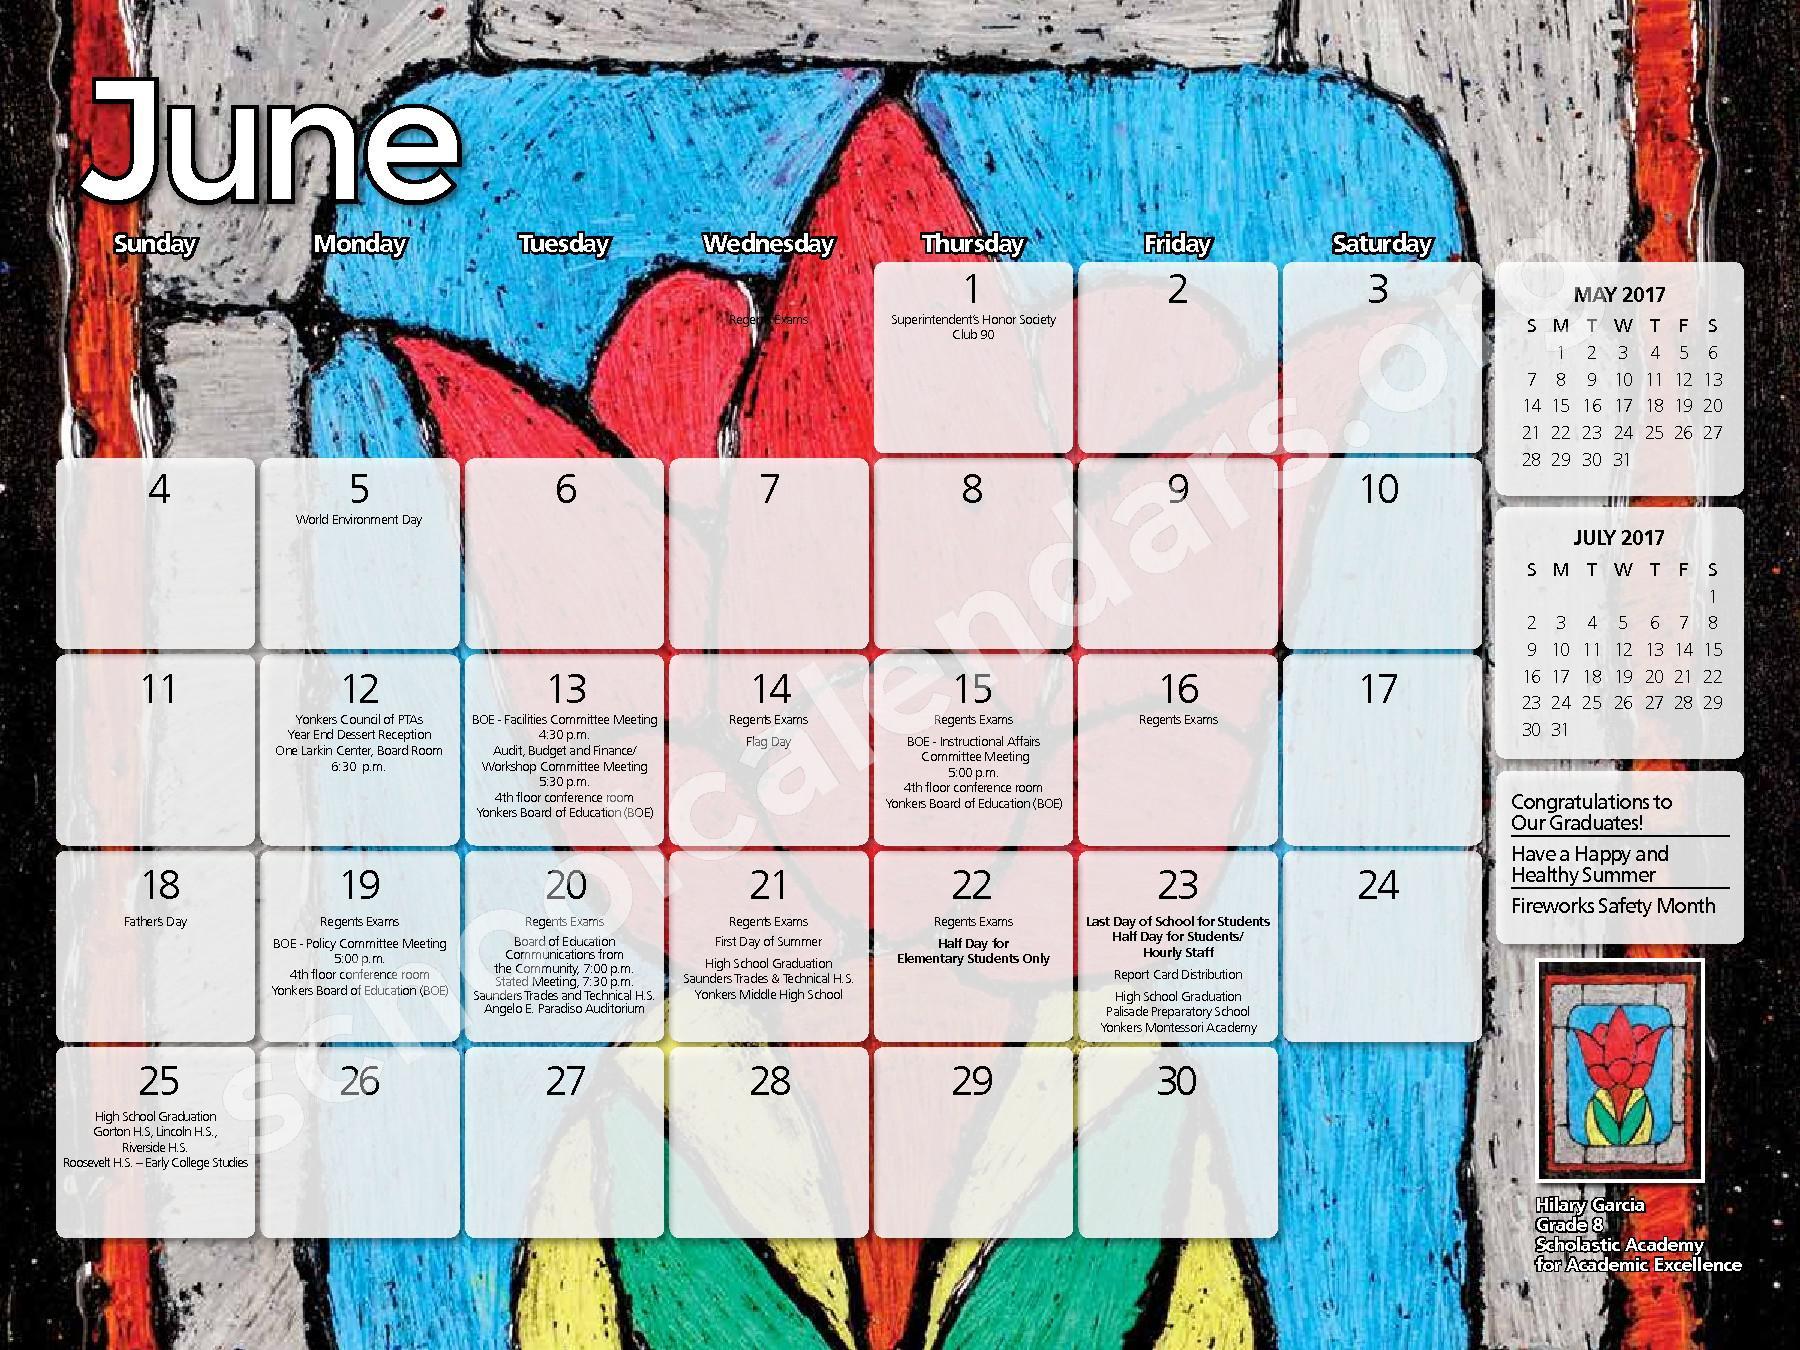 2016 - 2017  District Calendar – Yonkers City School District – page 10